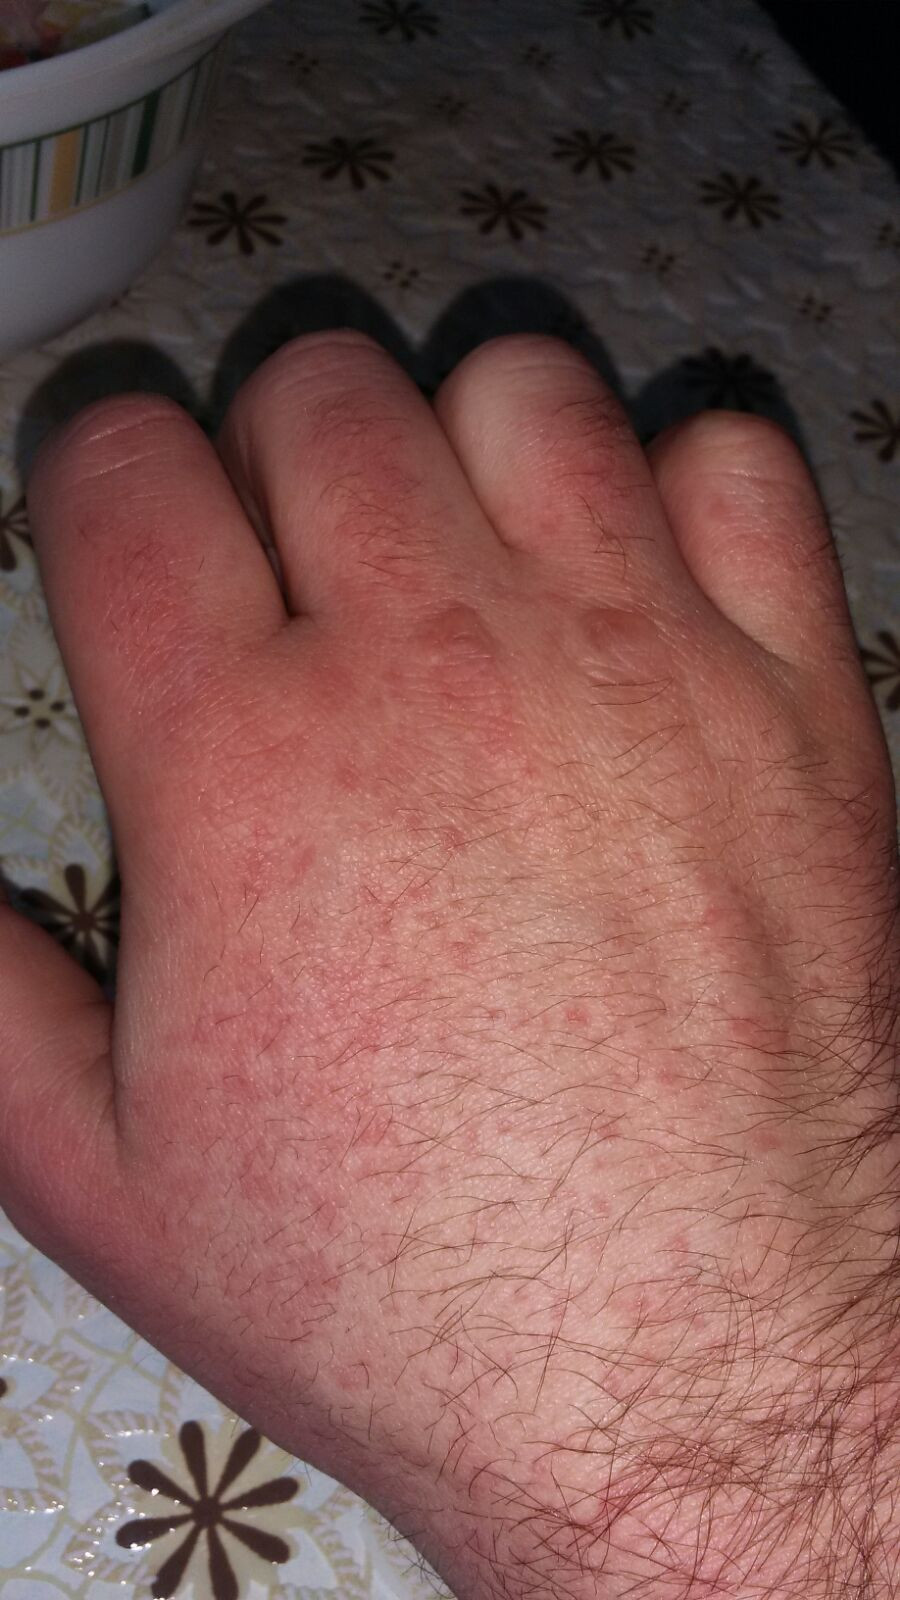 аллергия по всему телу у взрослого опасность